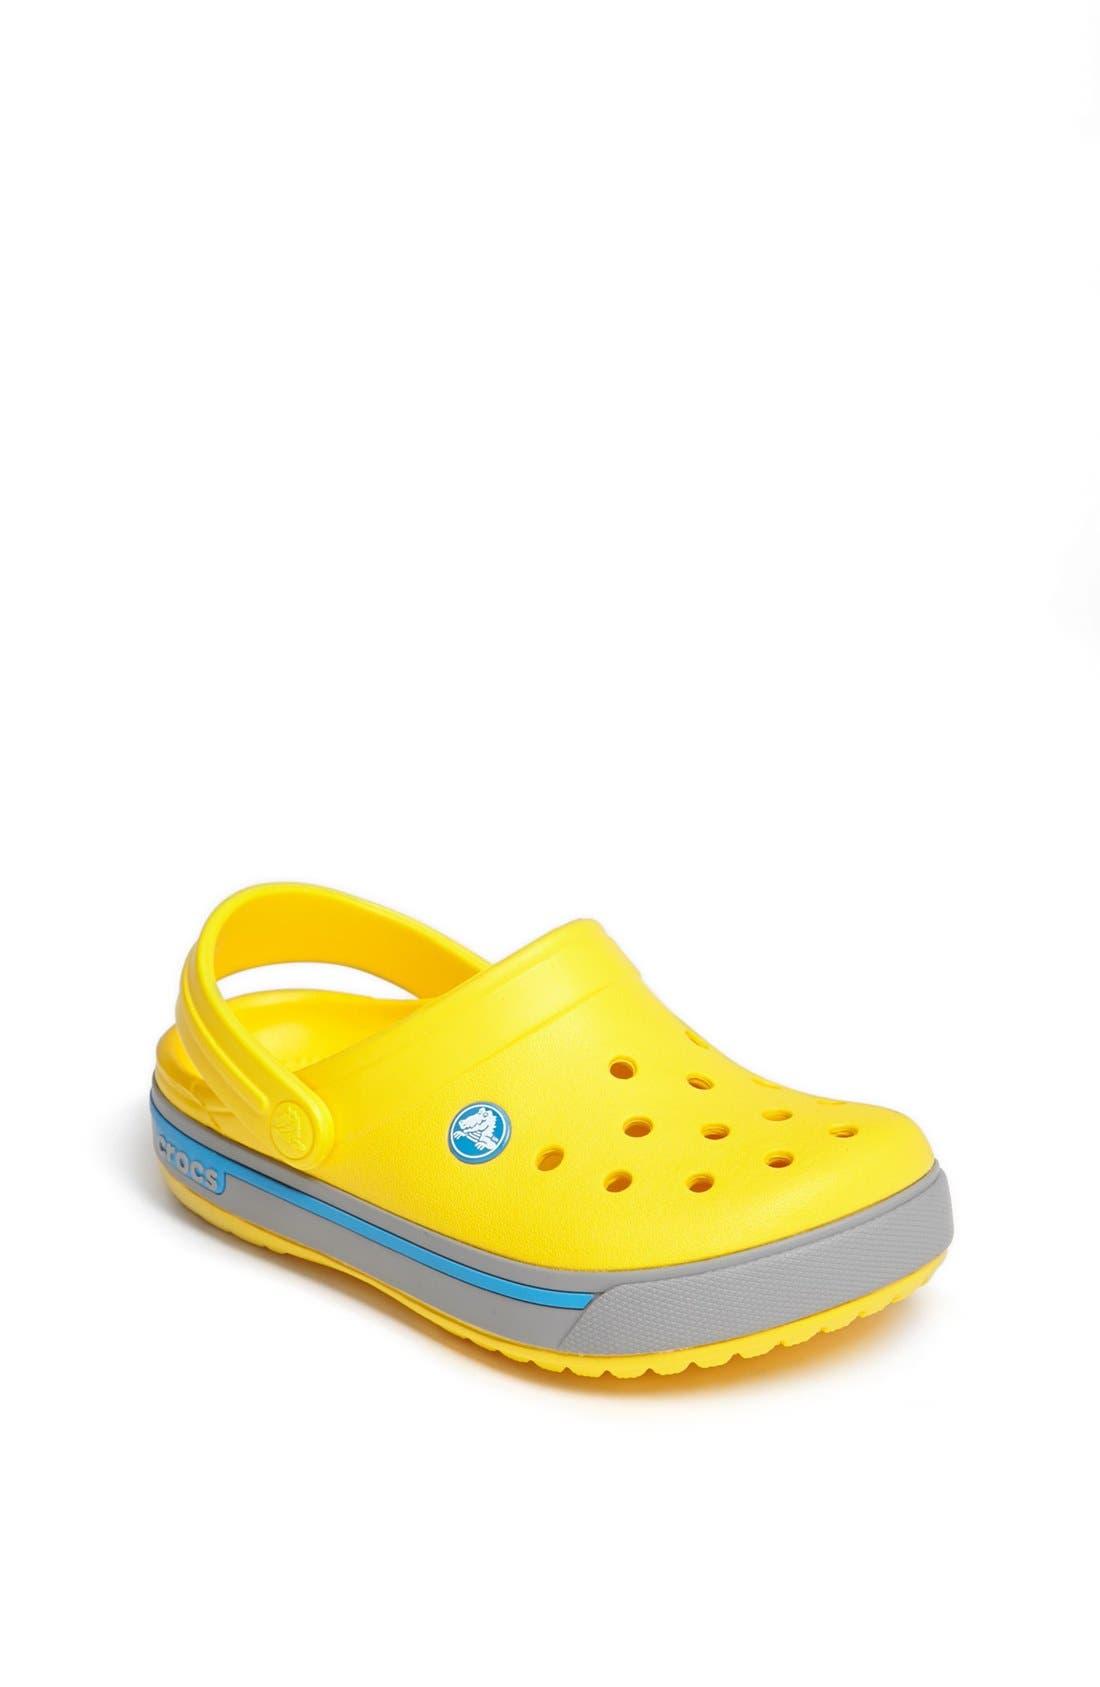 Main Image - CROCS™ 'Crocband II.5' Slip-On (Walker, Toddler & Little Kid)